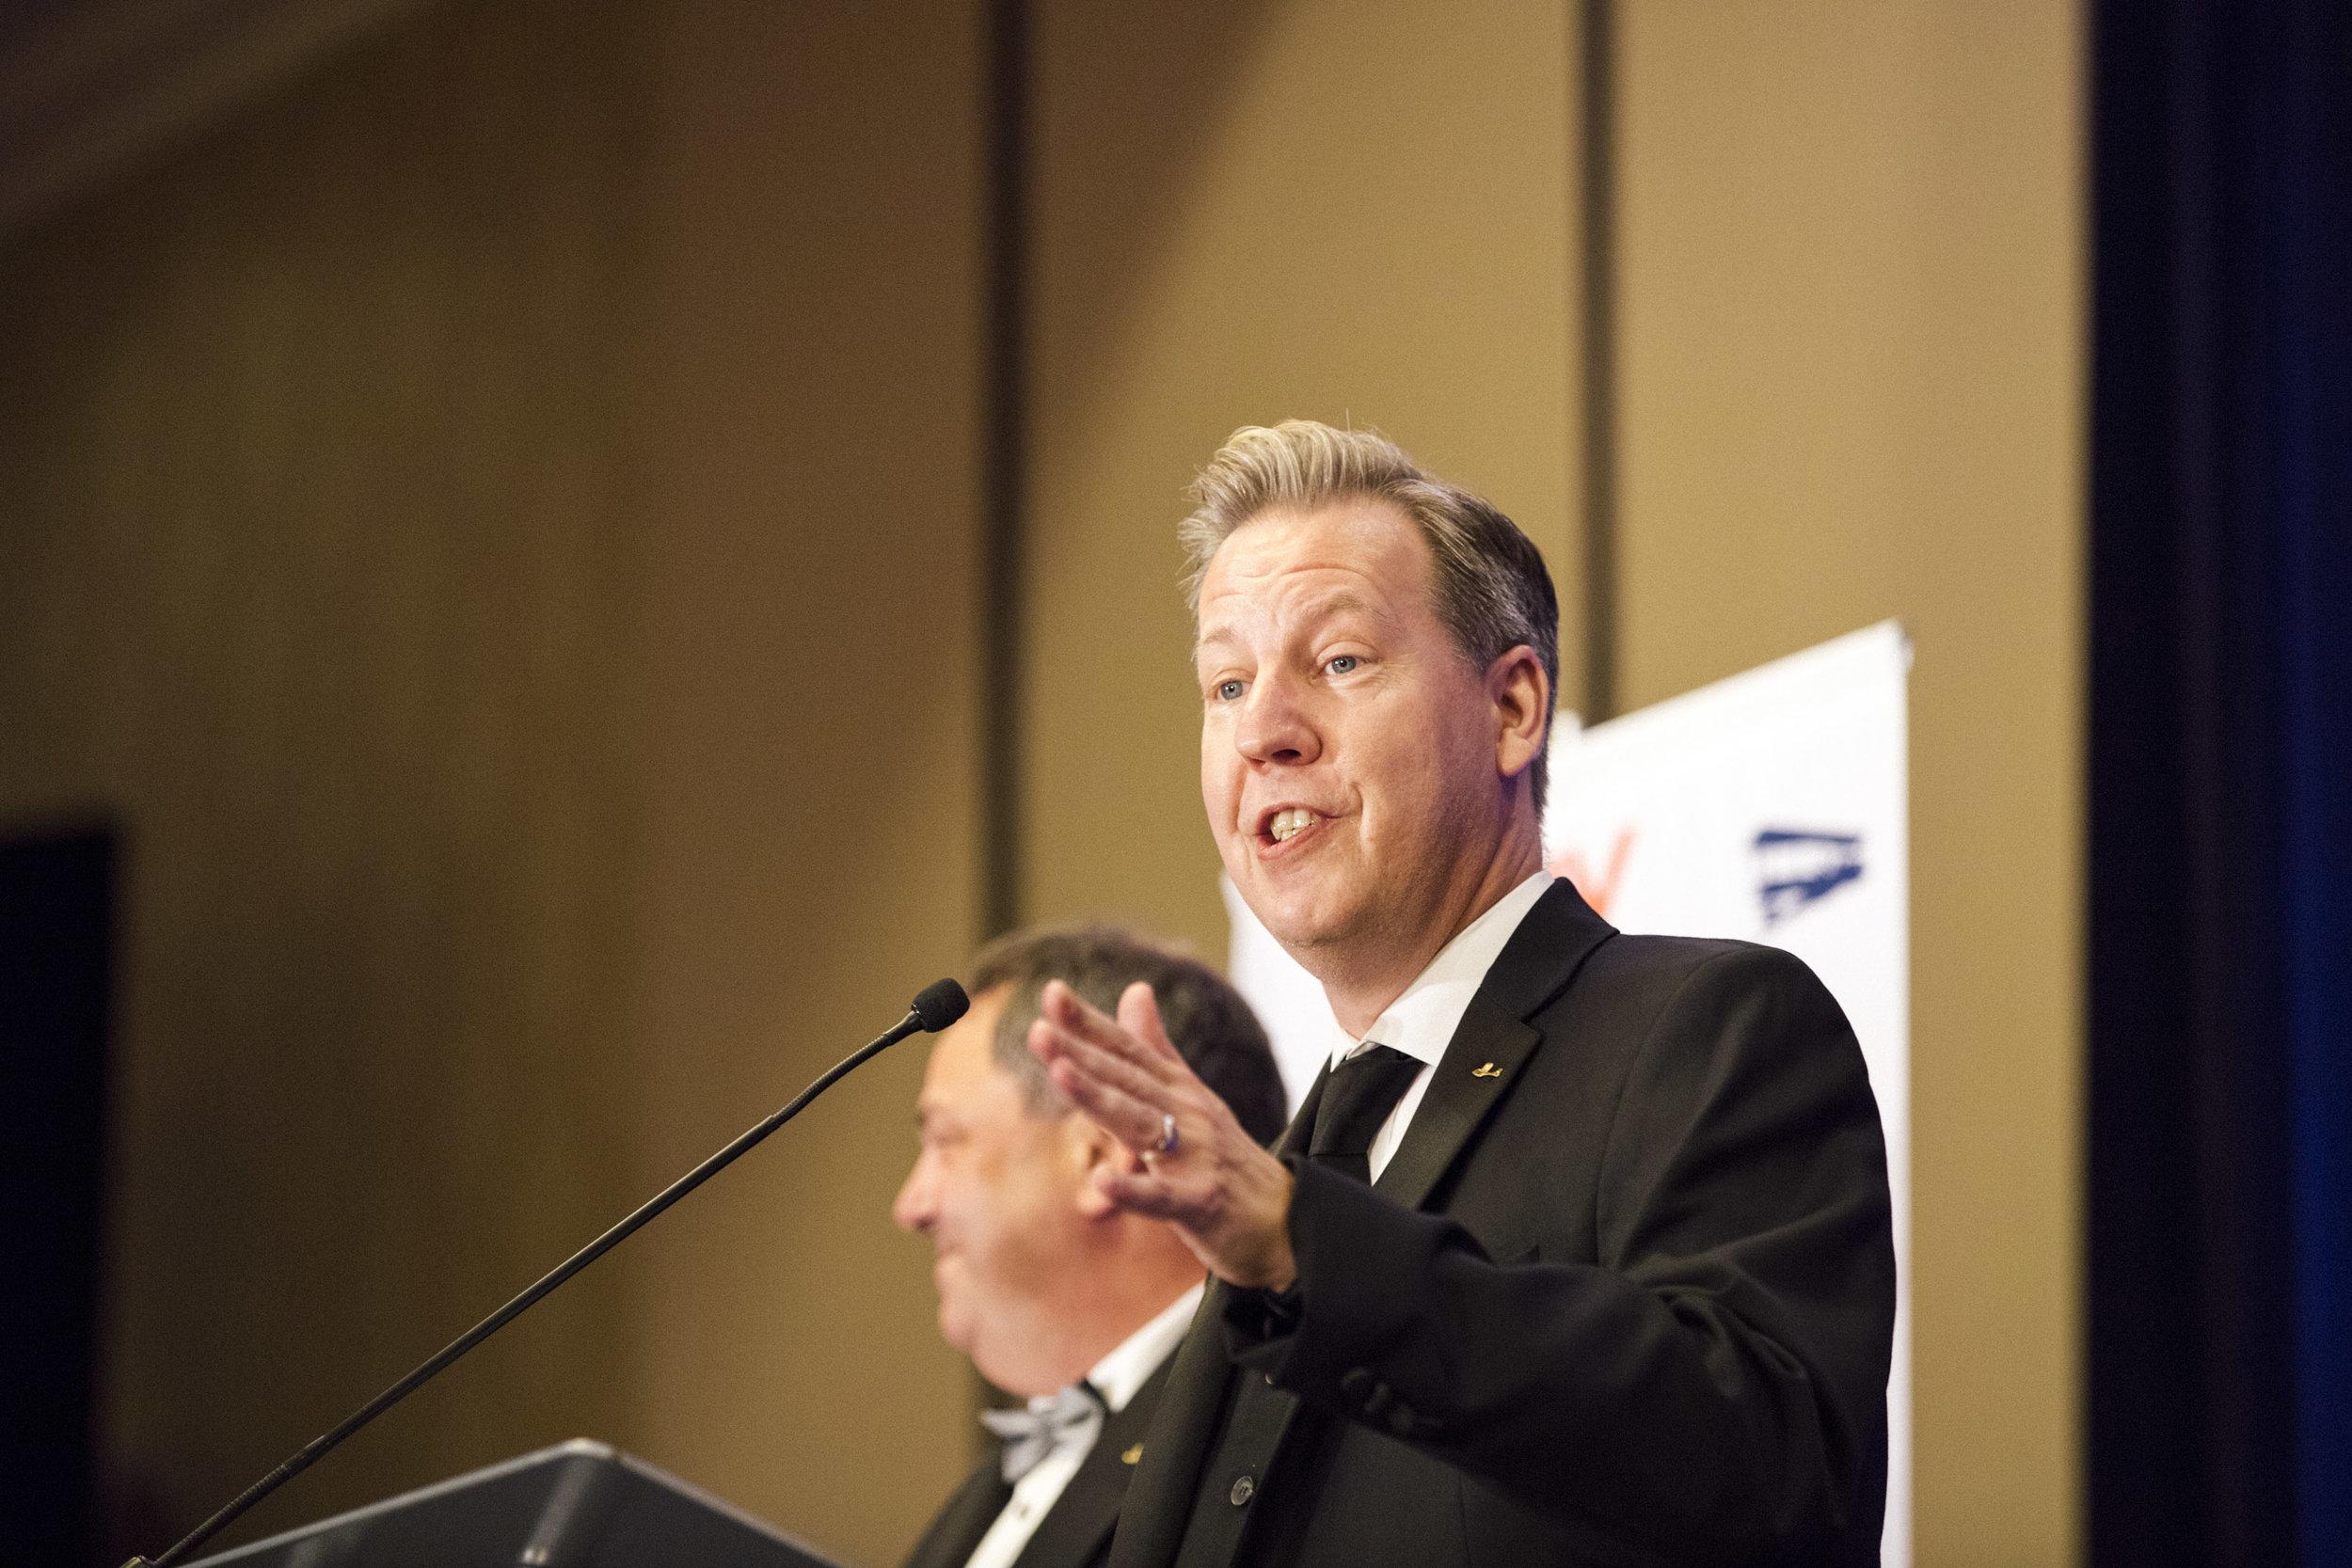 Patrick Harrison, Co-Chair